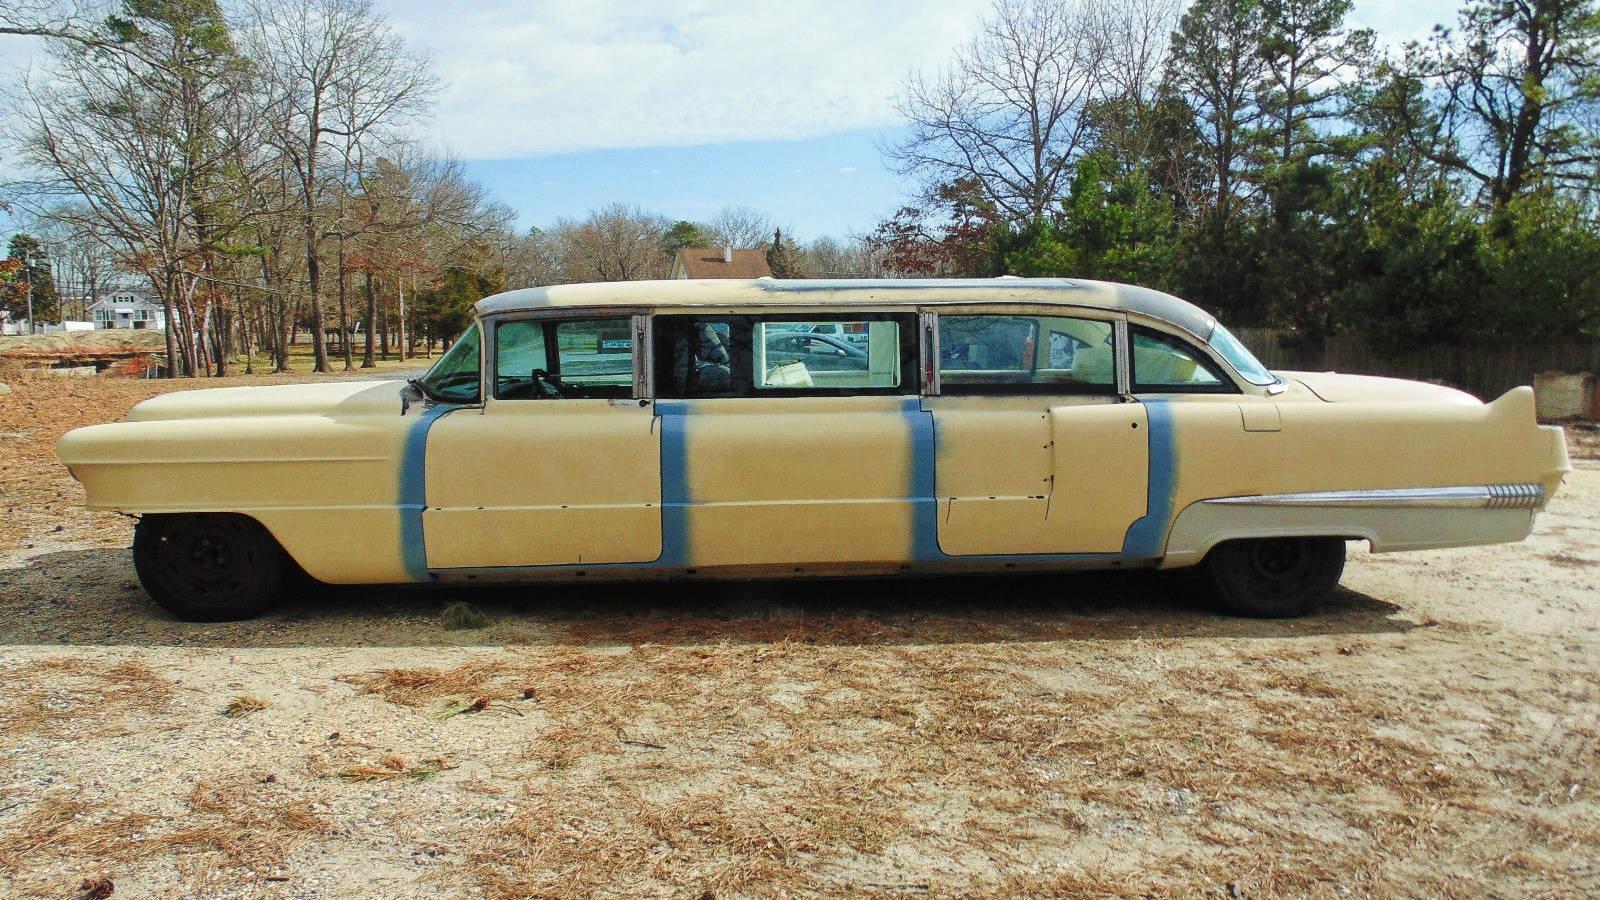 Fordillac: 1956 Cadillac Fleetwood 60 Special